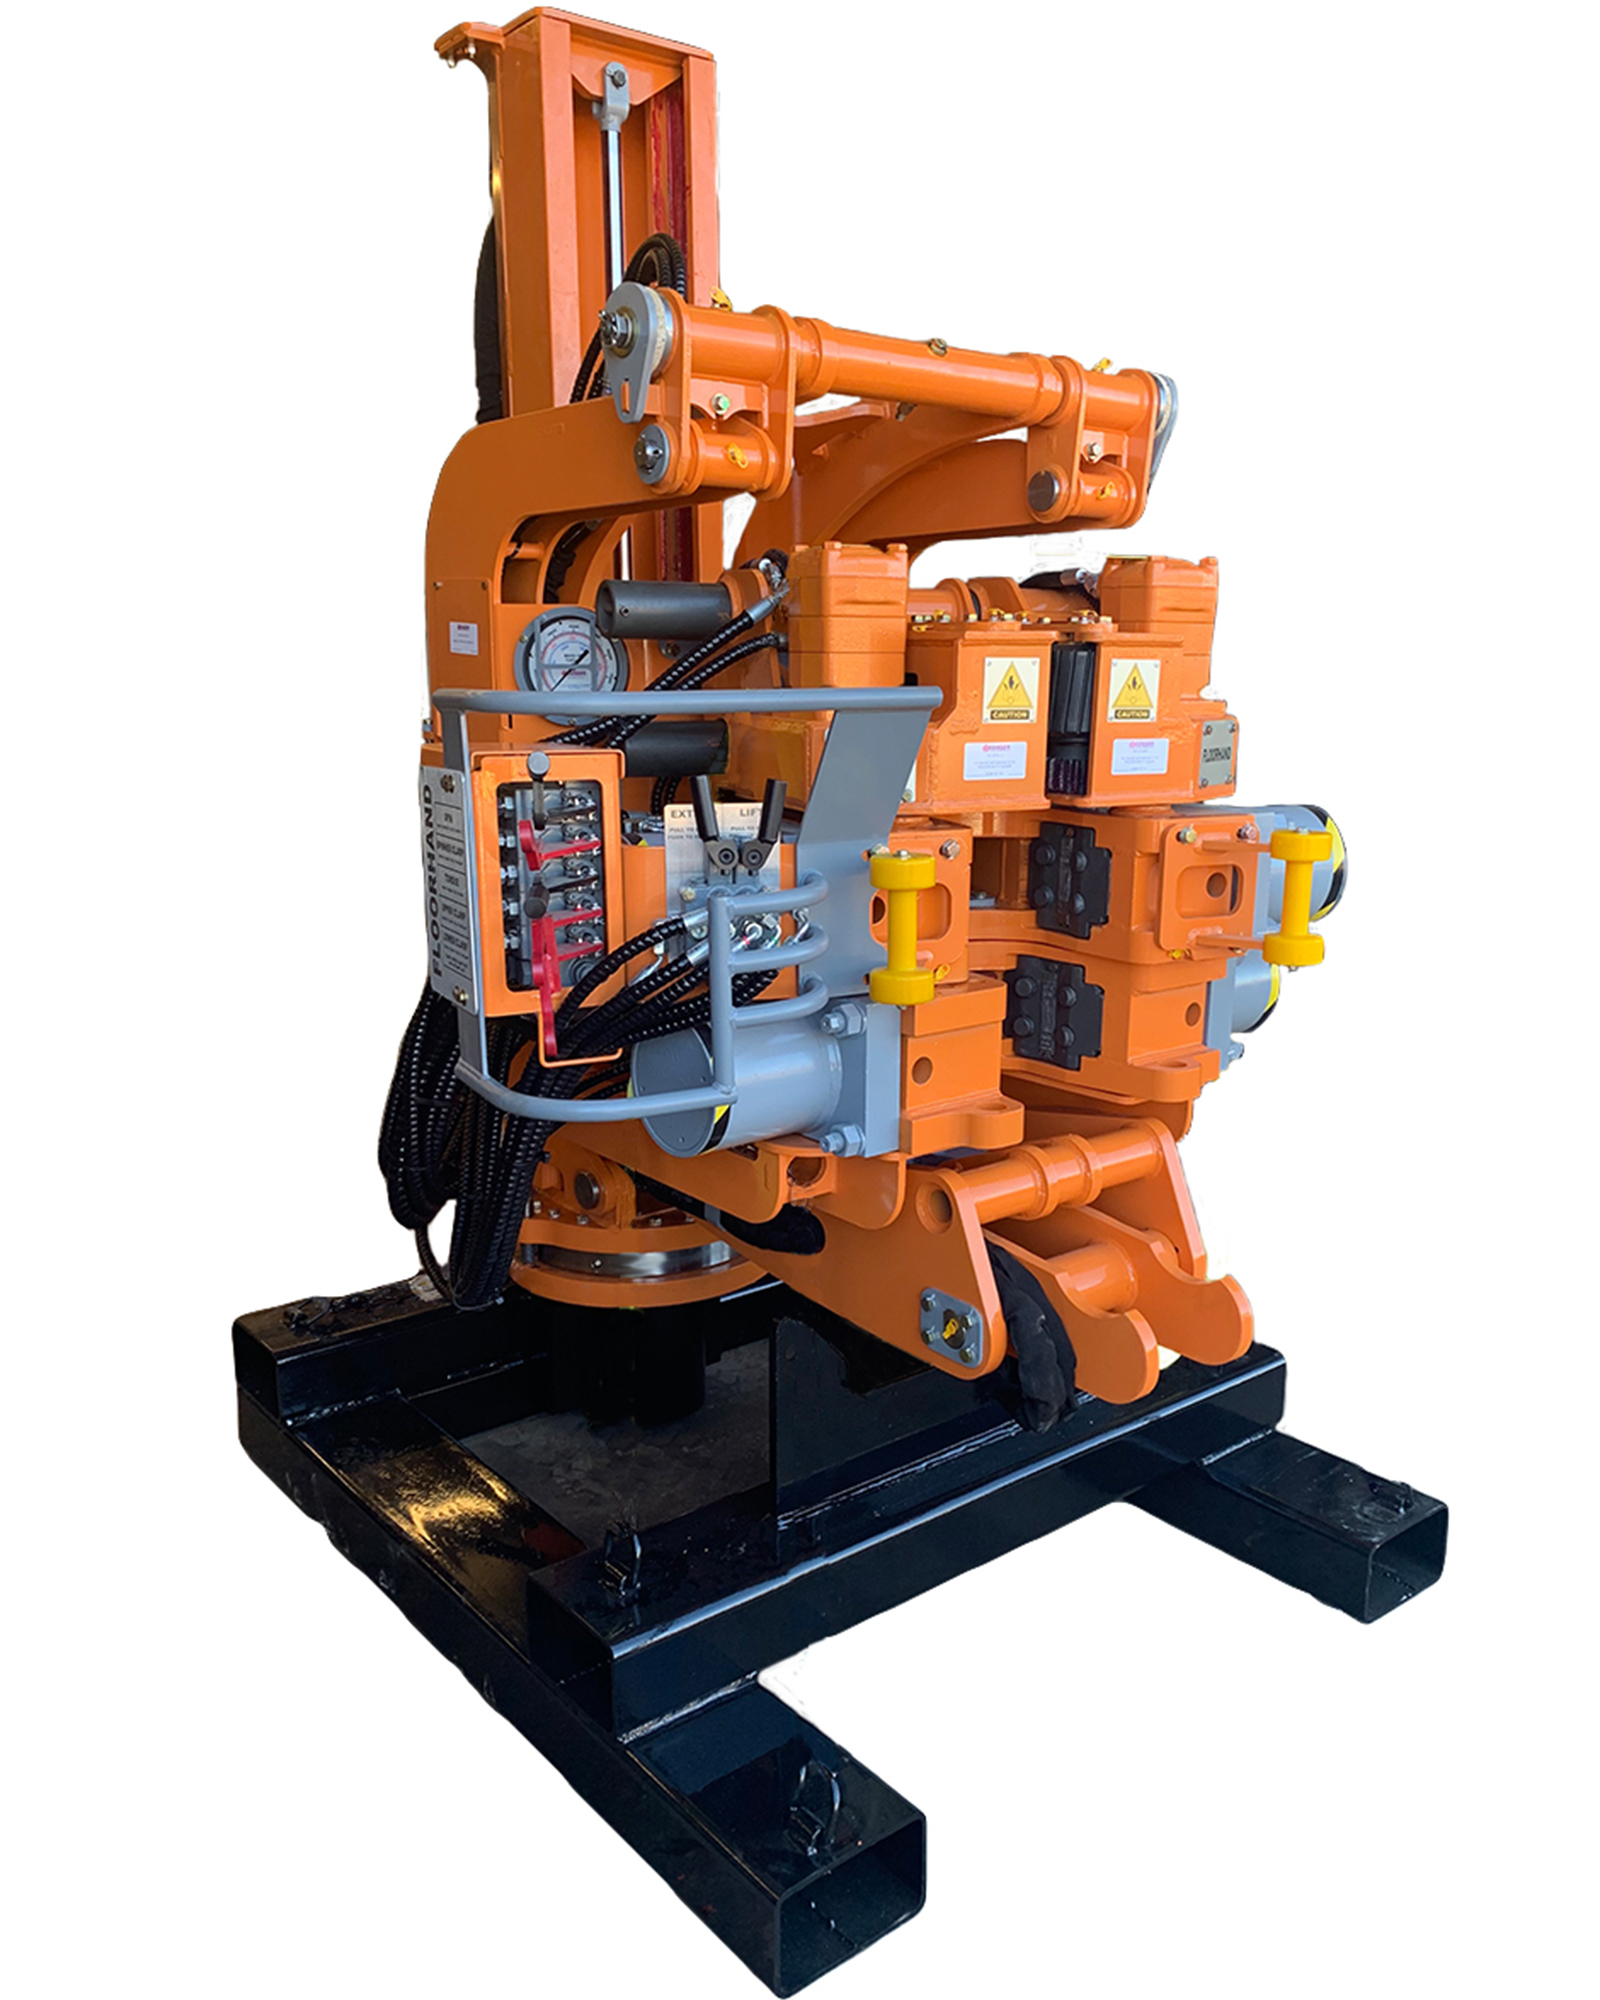 Blohm and Voss Floorhand Parts